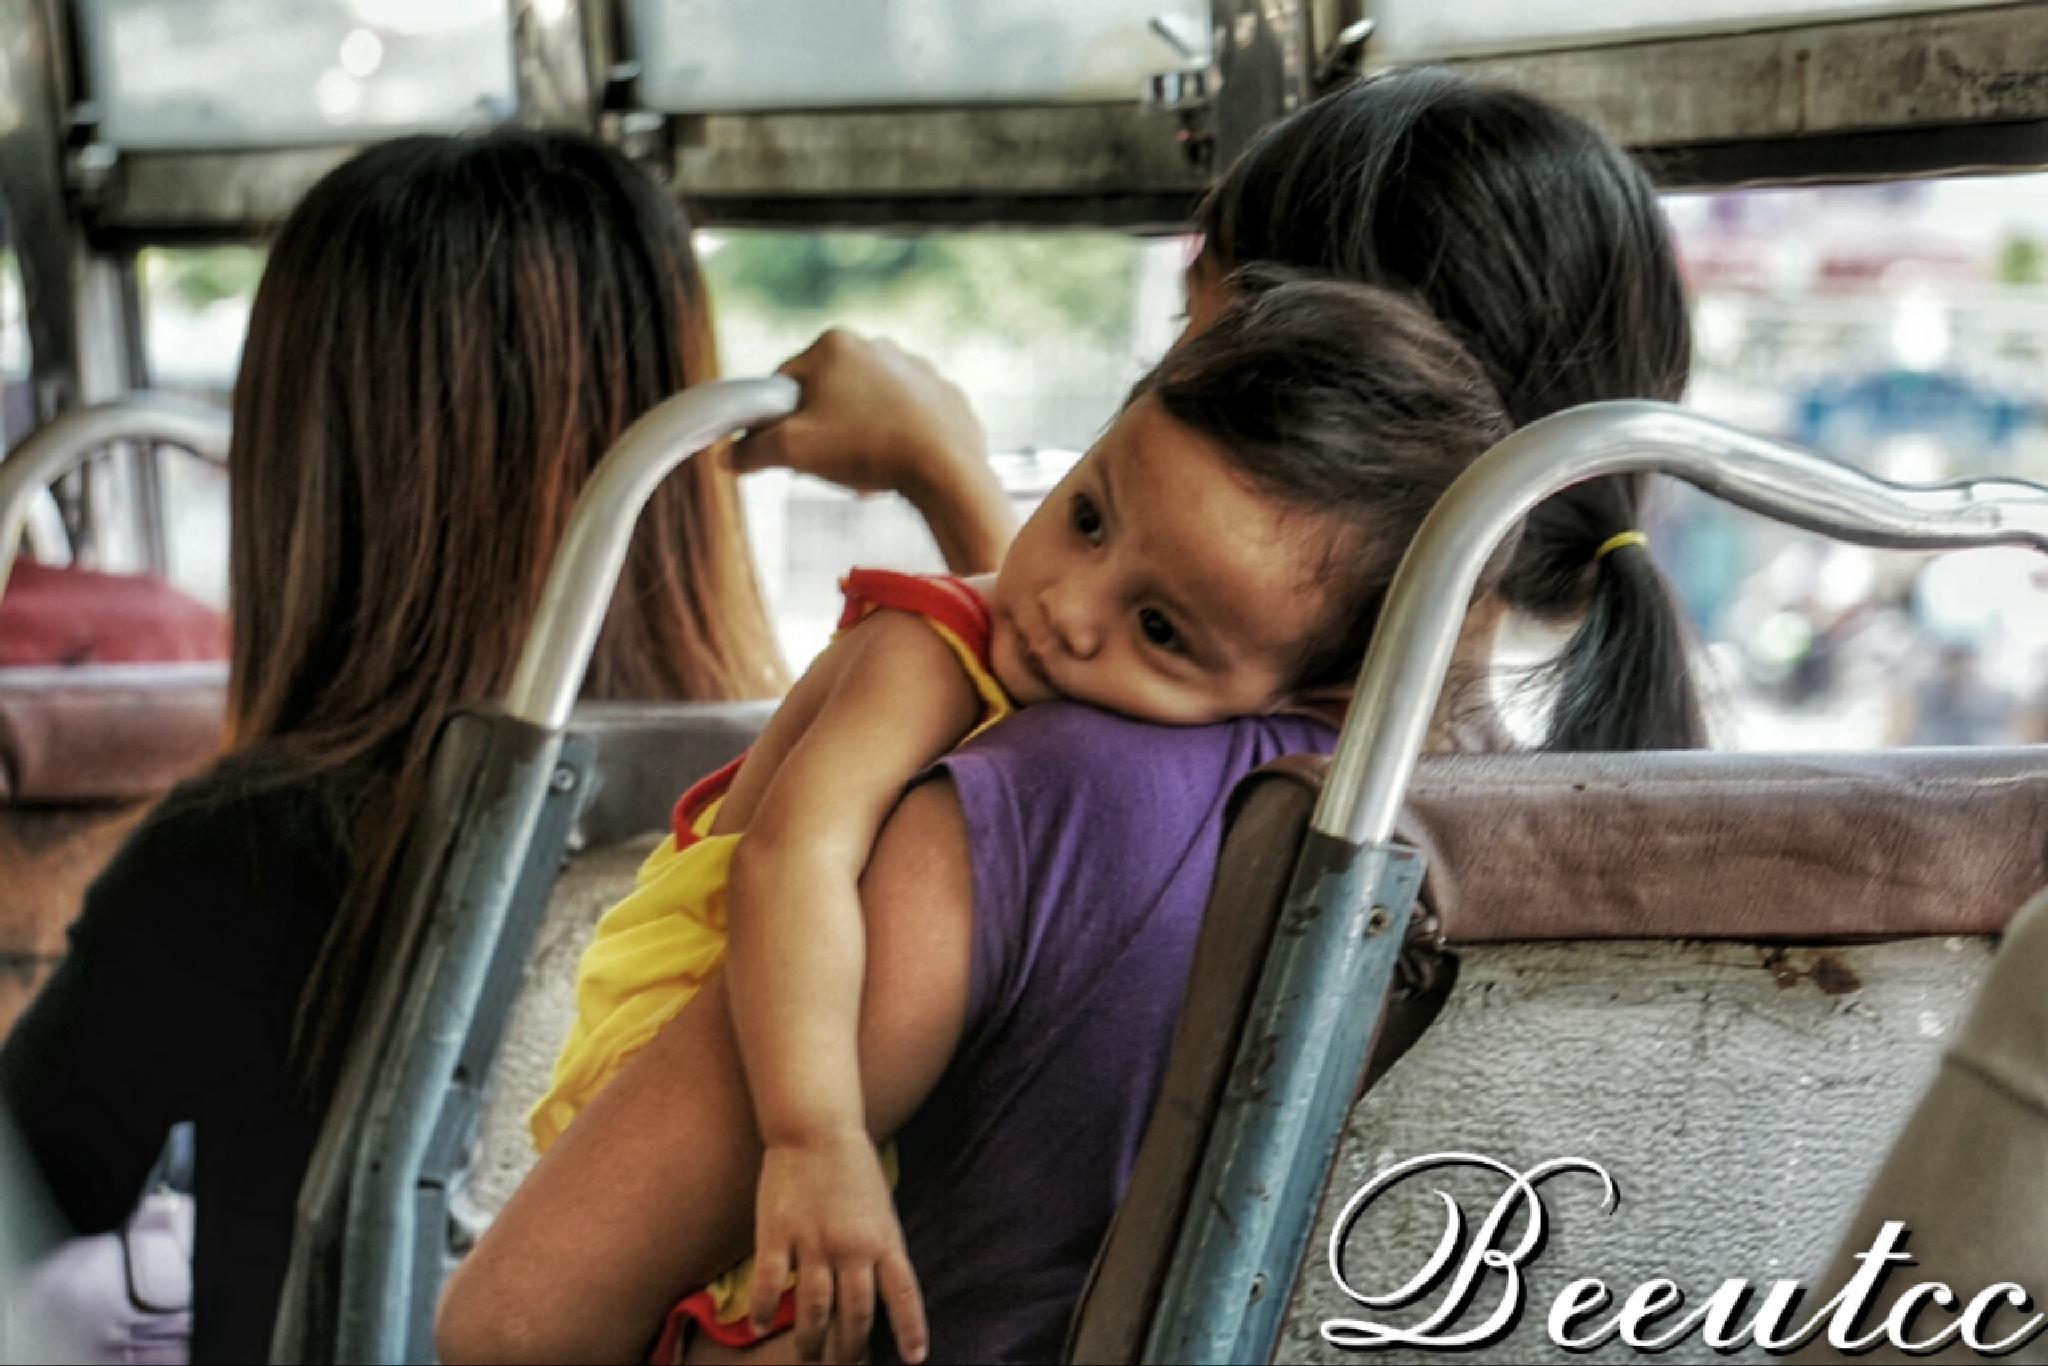 True love last a lifetime by Natthawut Meesri